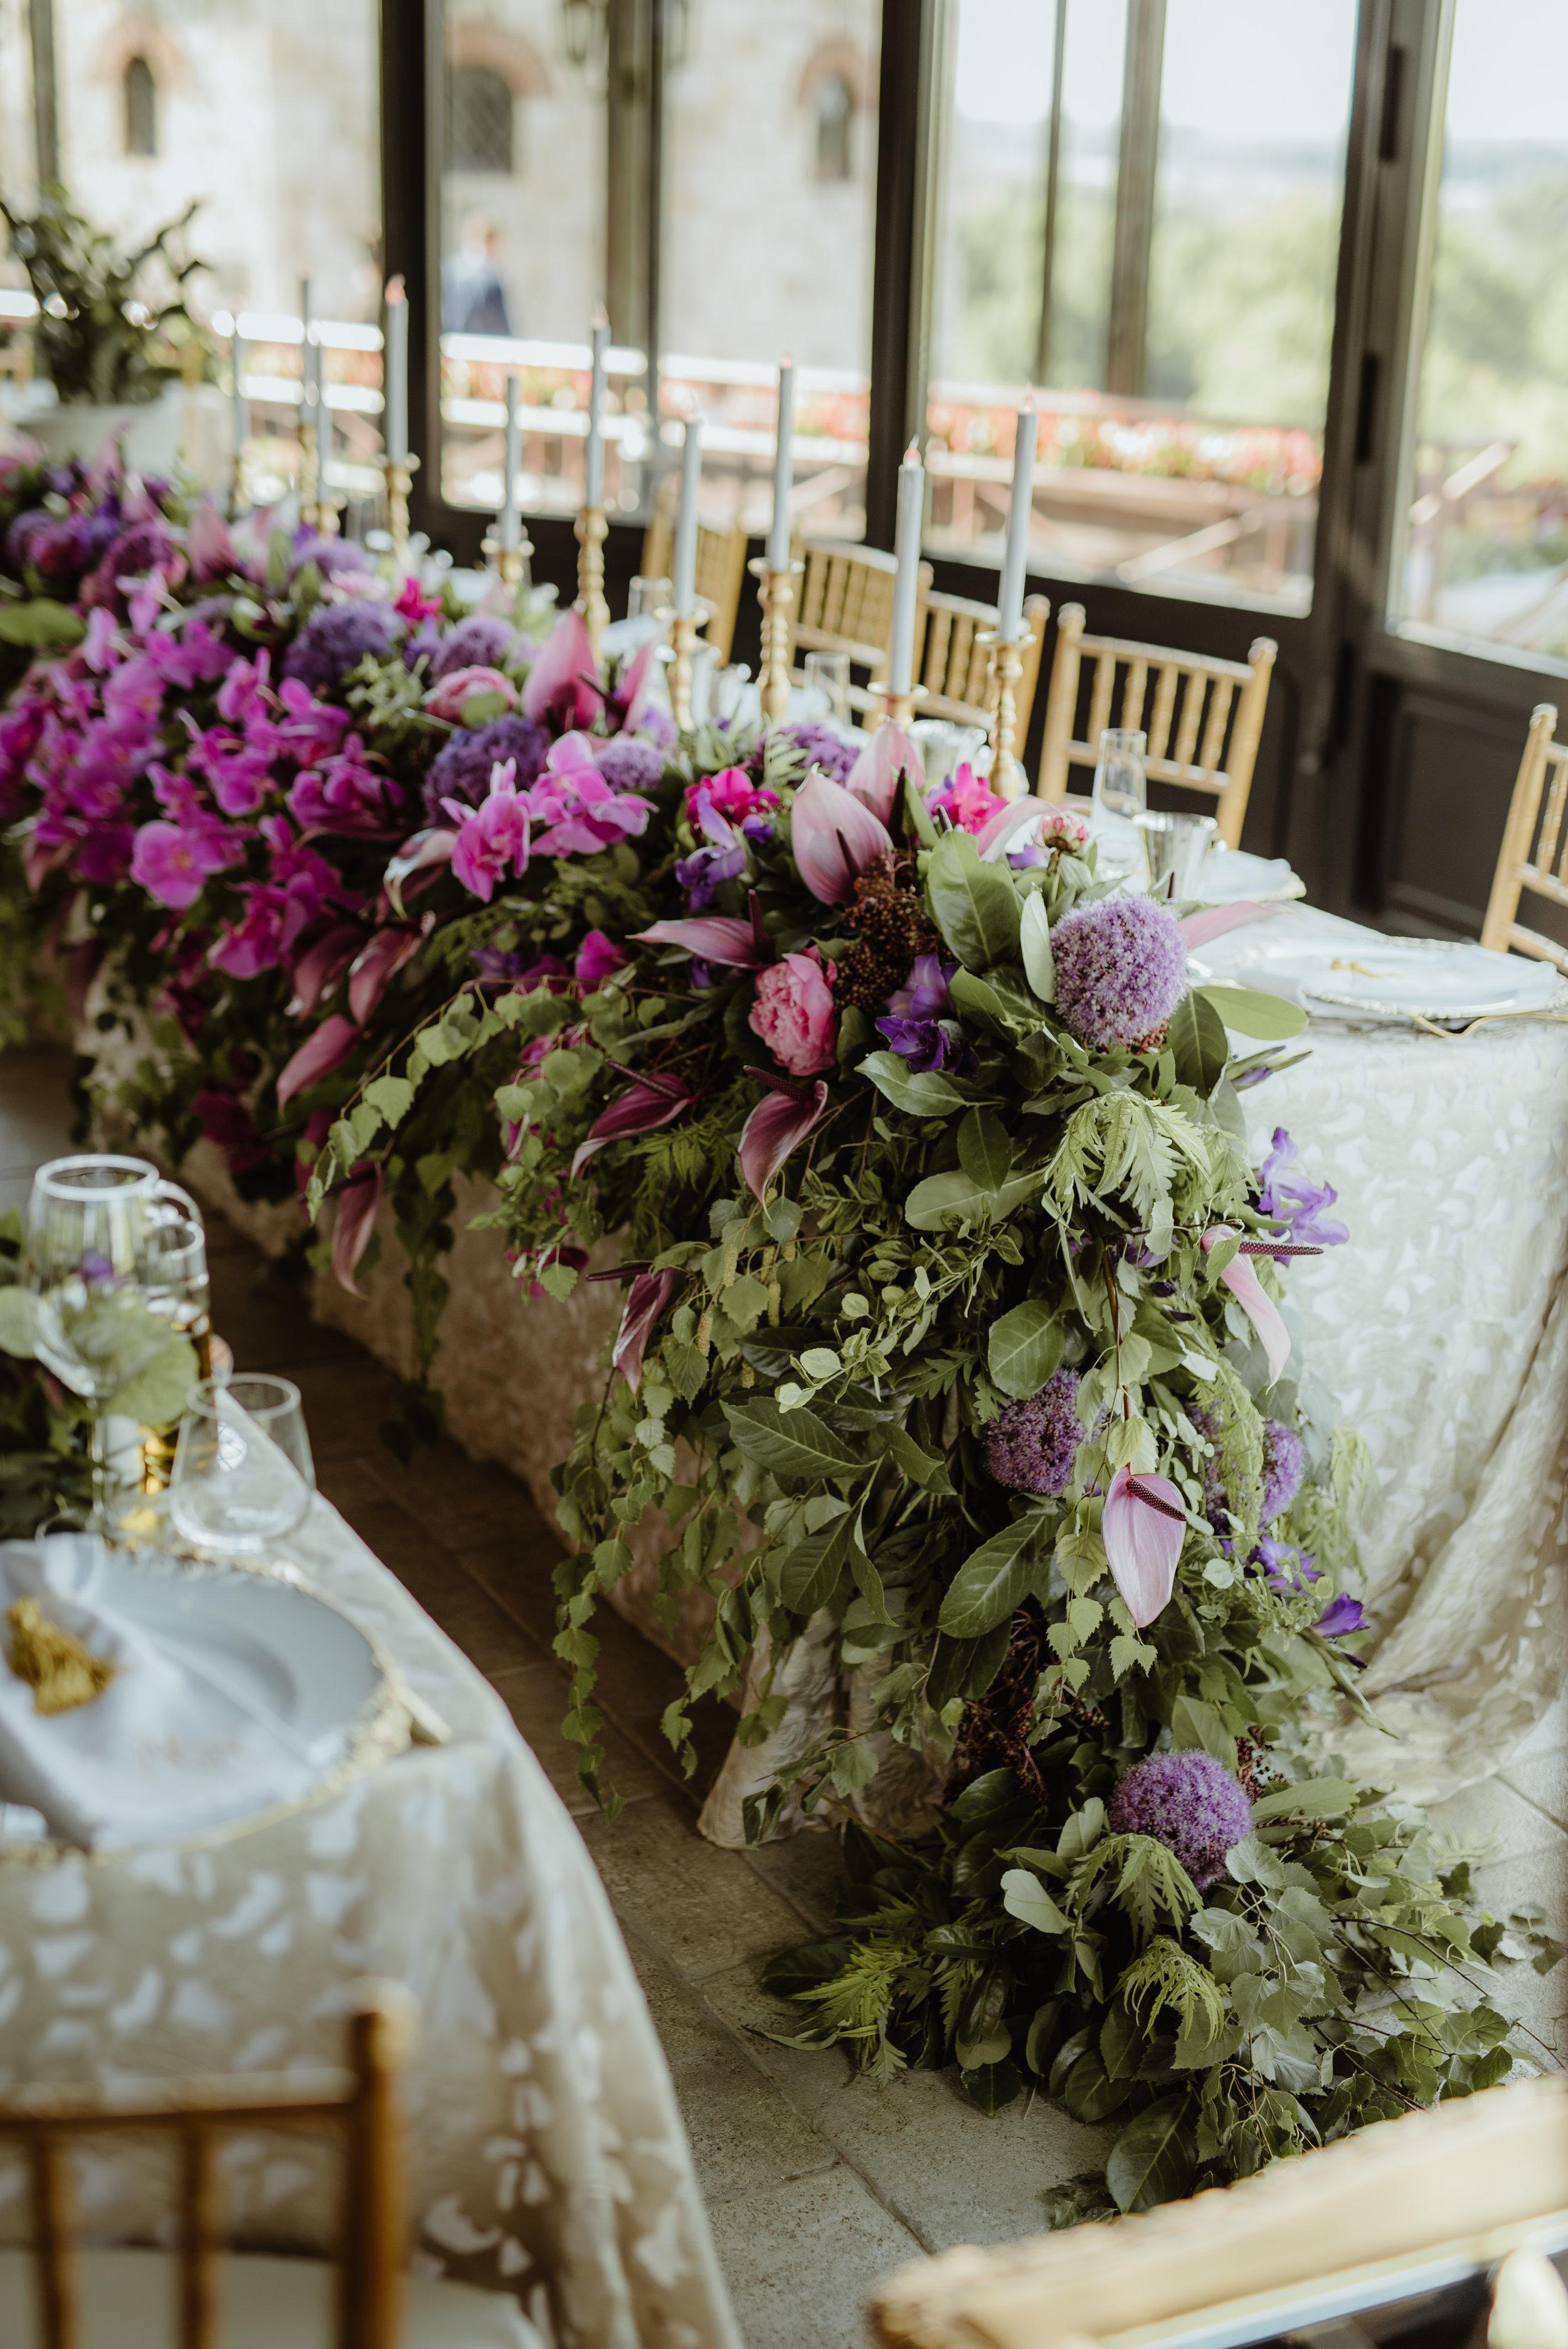 Fresh_flowers_bridal_table_pink_purple_candles_candelabras_luxury_linen.jpg